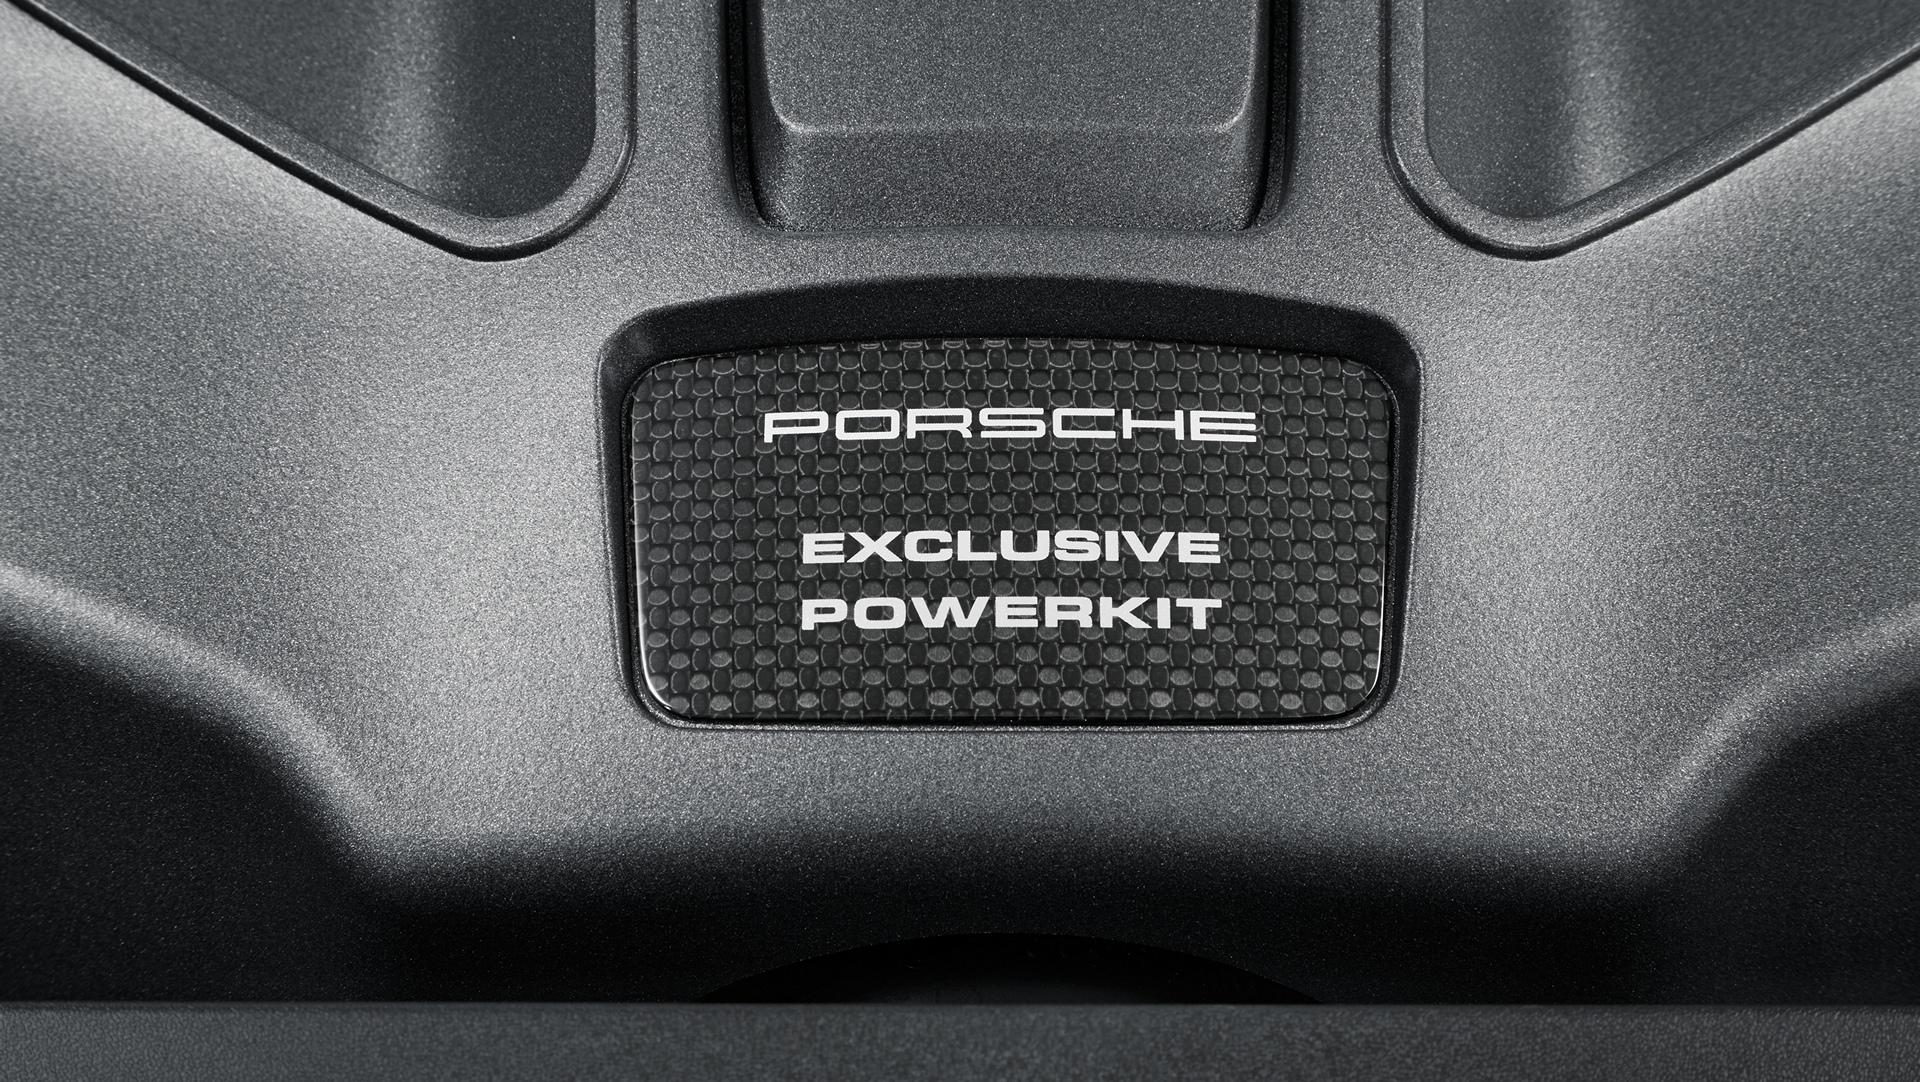 Porsche Macan Turbo © Dr. Ing. h.c. F. Porsche AG